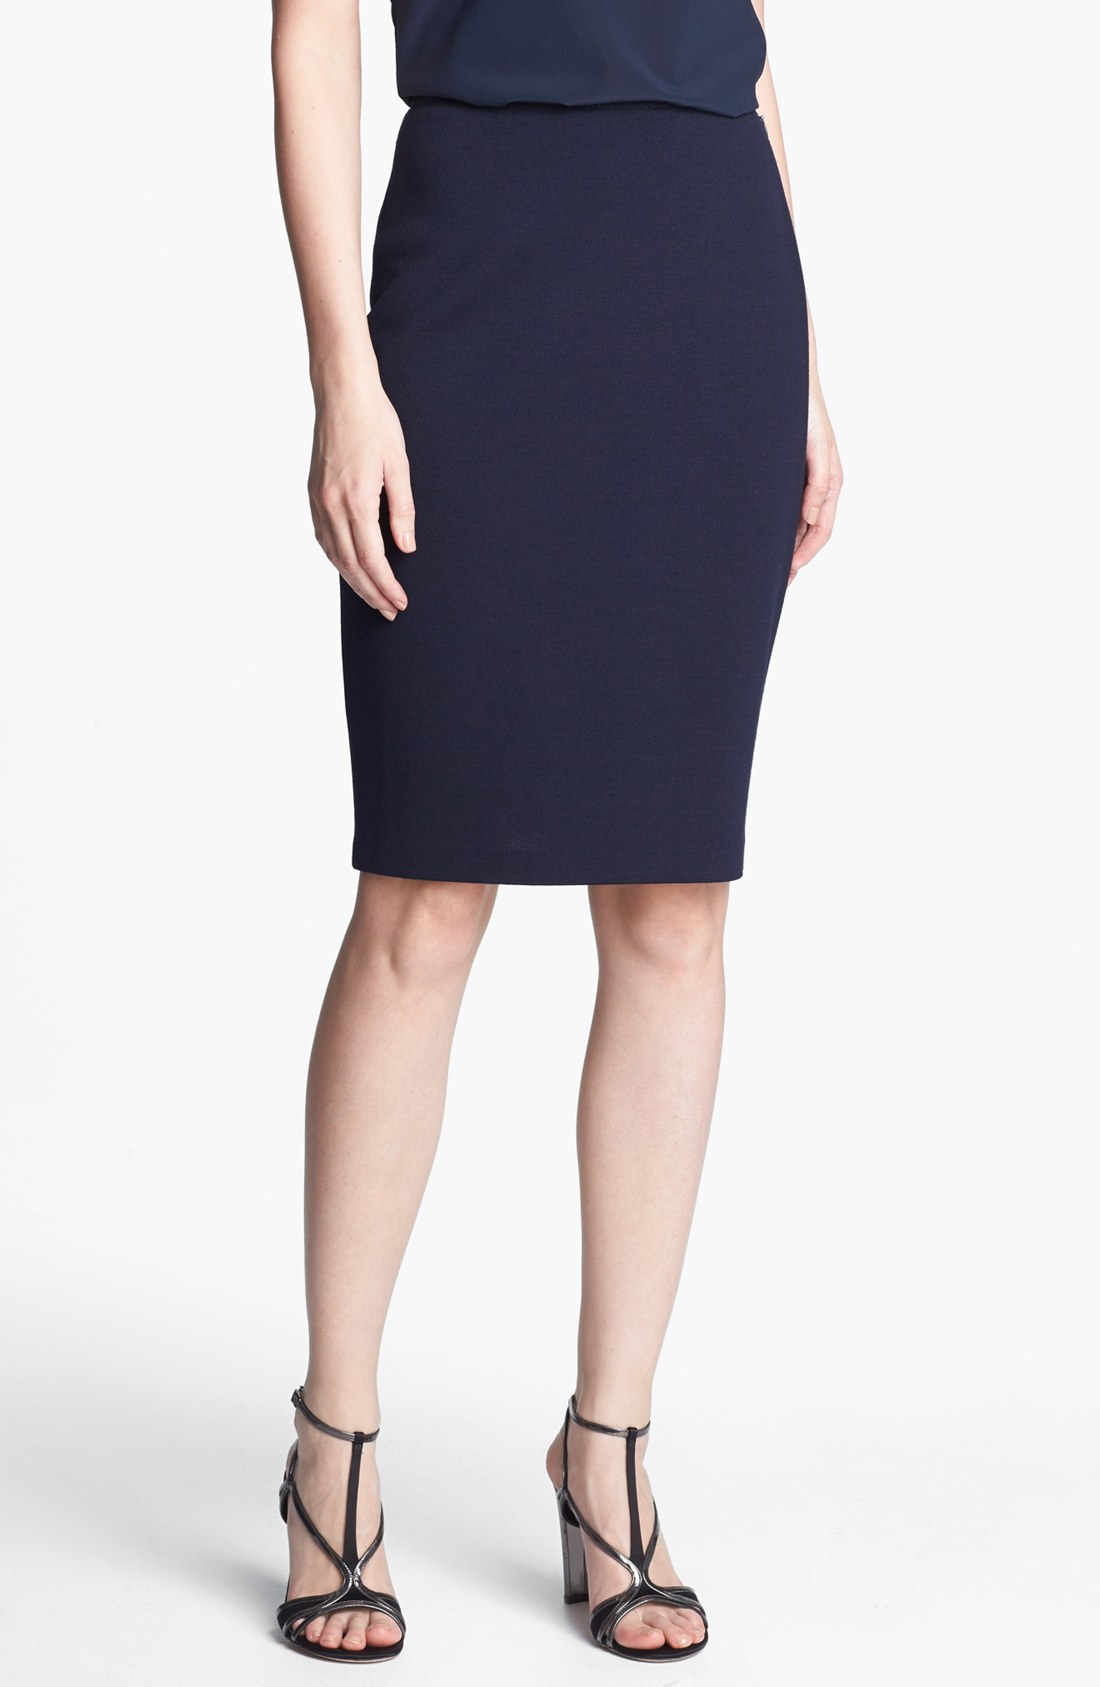 St. John Milano Knit Pencil Skirt in Blue (Navy) | Lyst